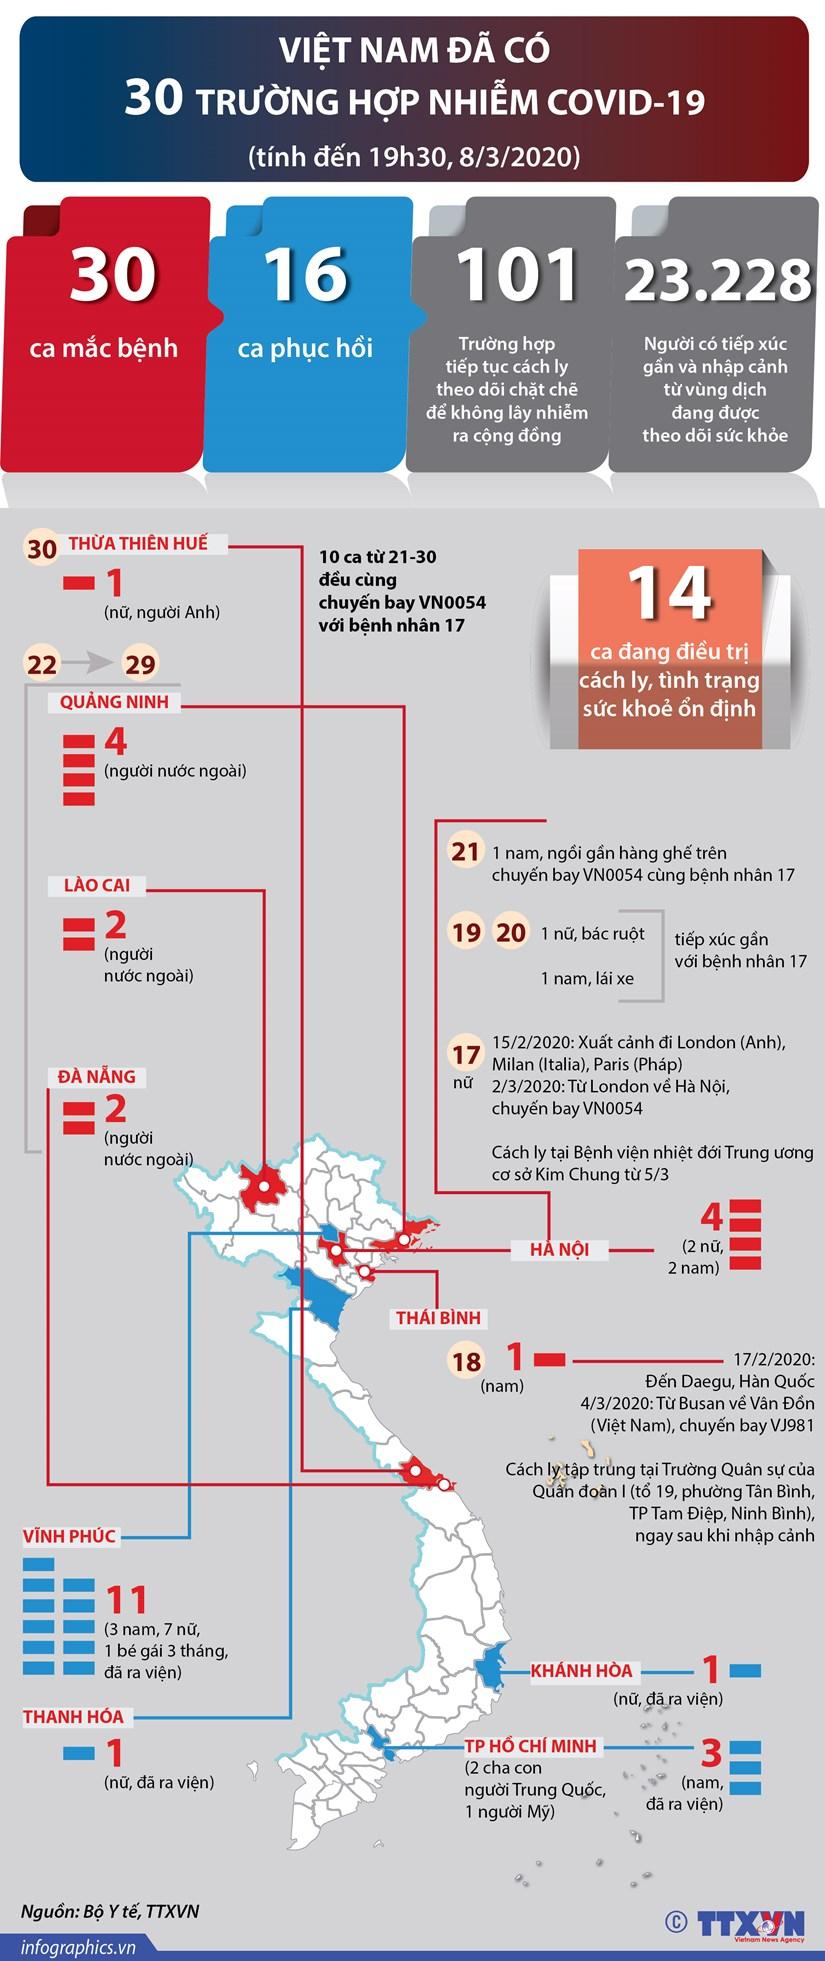 [Infographics] Viet Nam da co 30 truong hop nhiem COVID-19 hinh anh 1